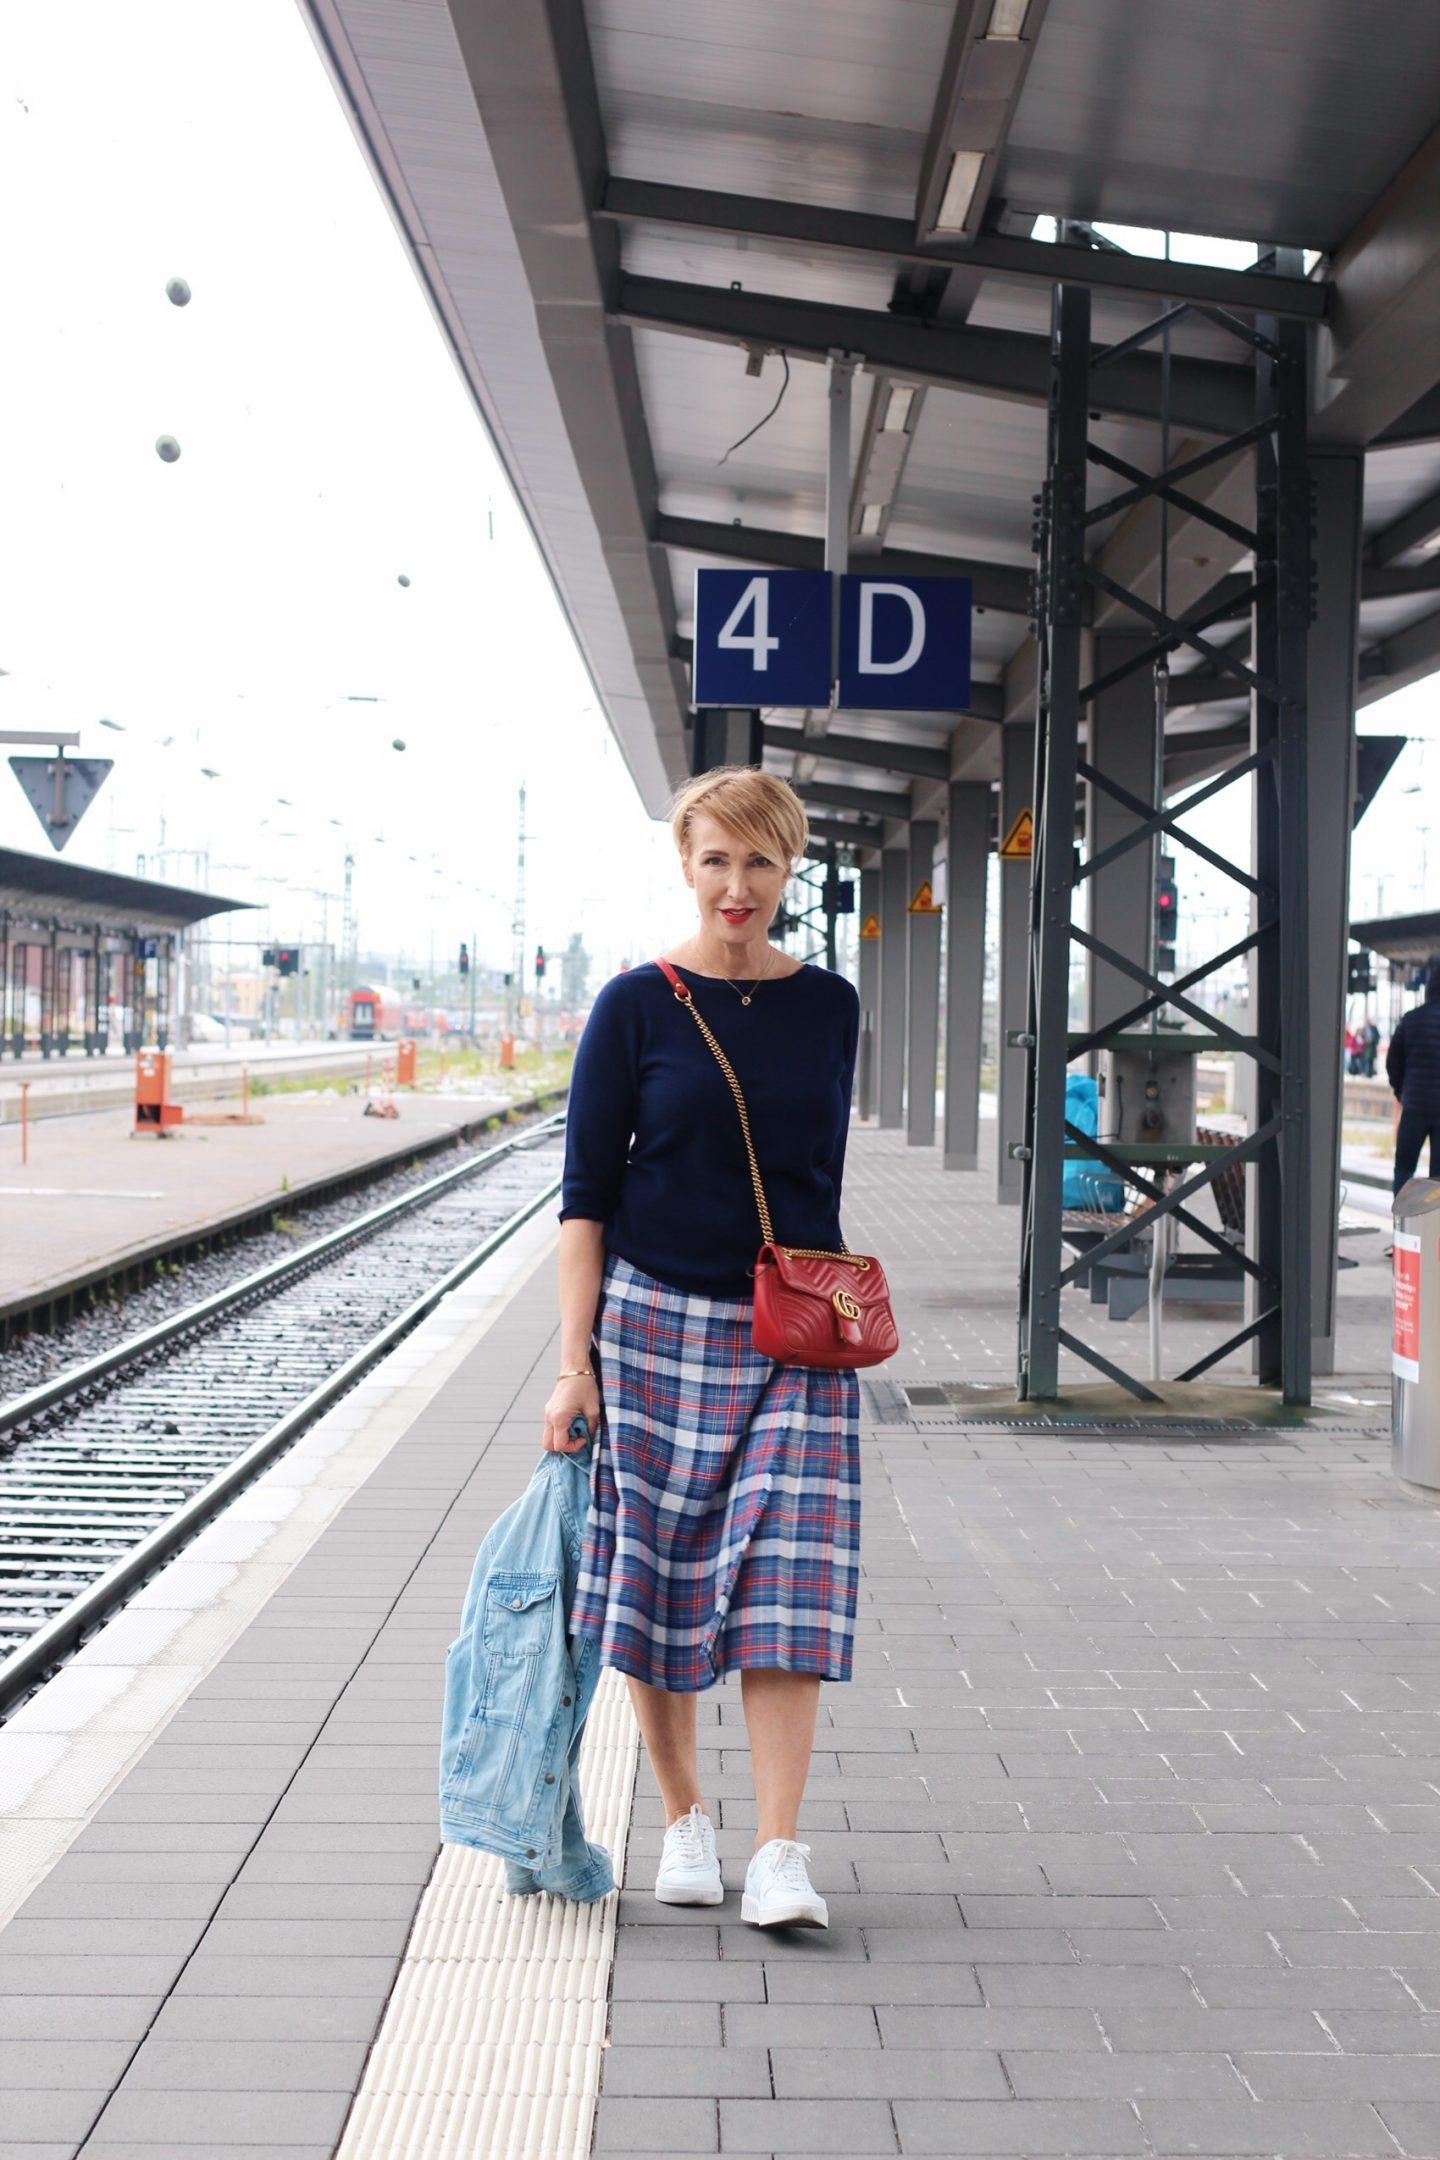 Die perfekte Jacke auf Reisen – die Jeansjacke